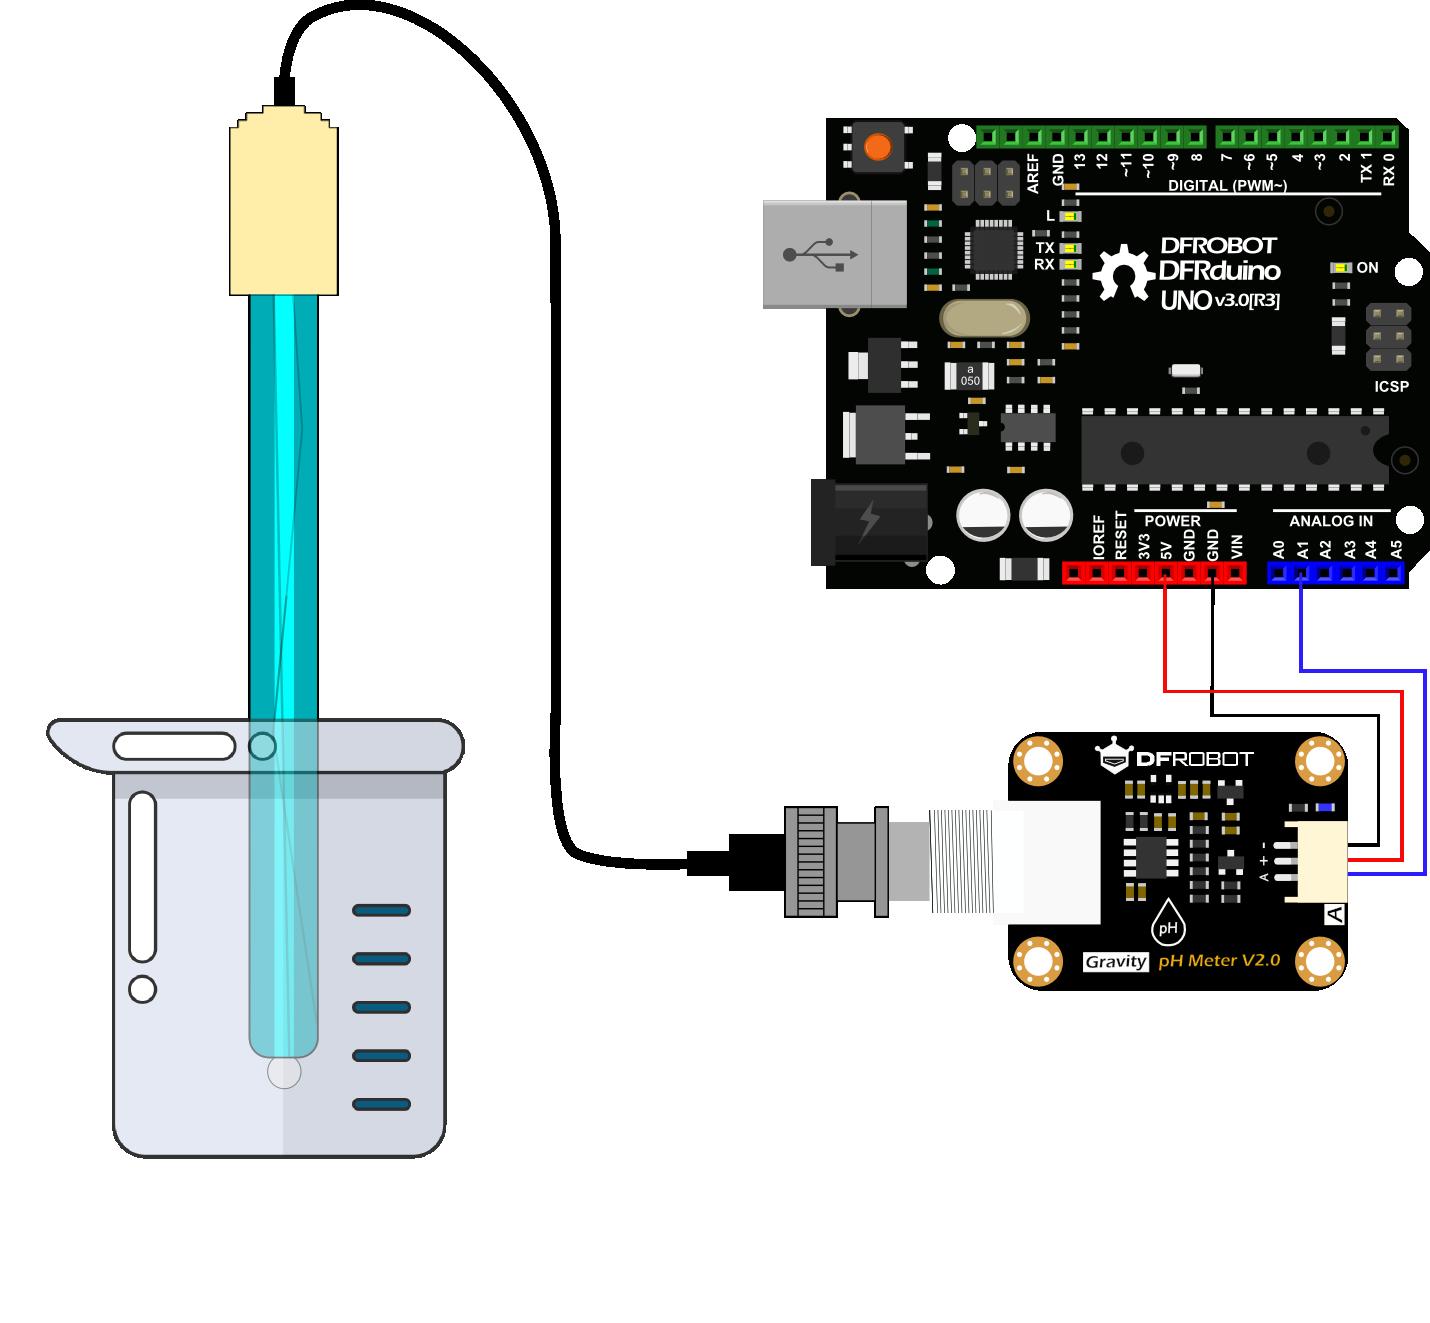 Gravity: Analog pH Sensor /Meter Pro V2